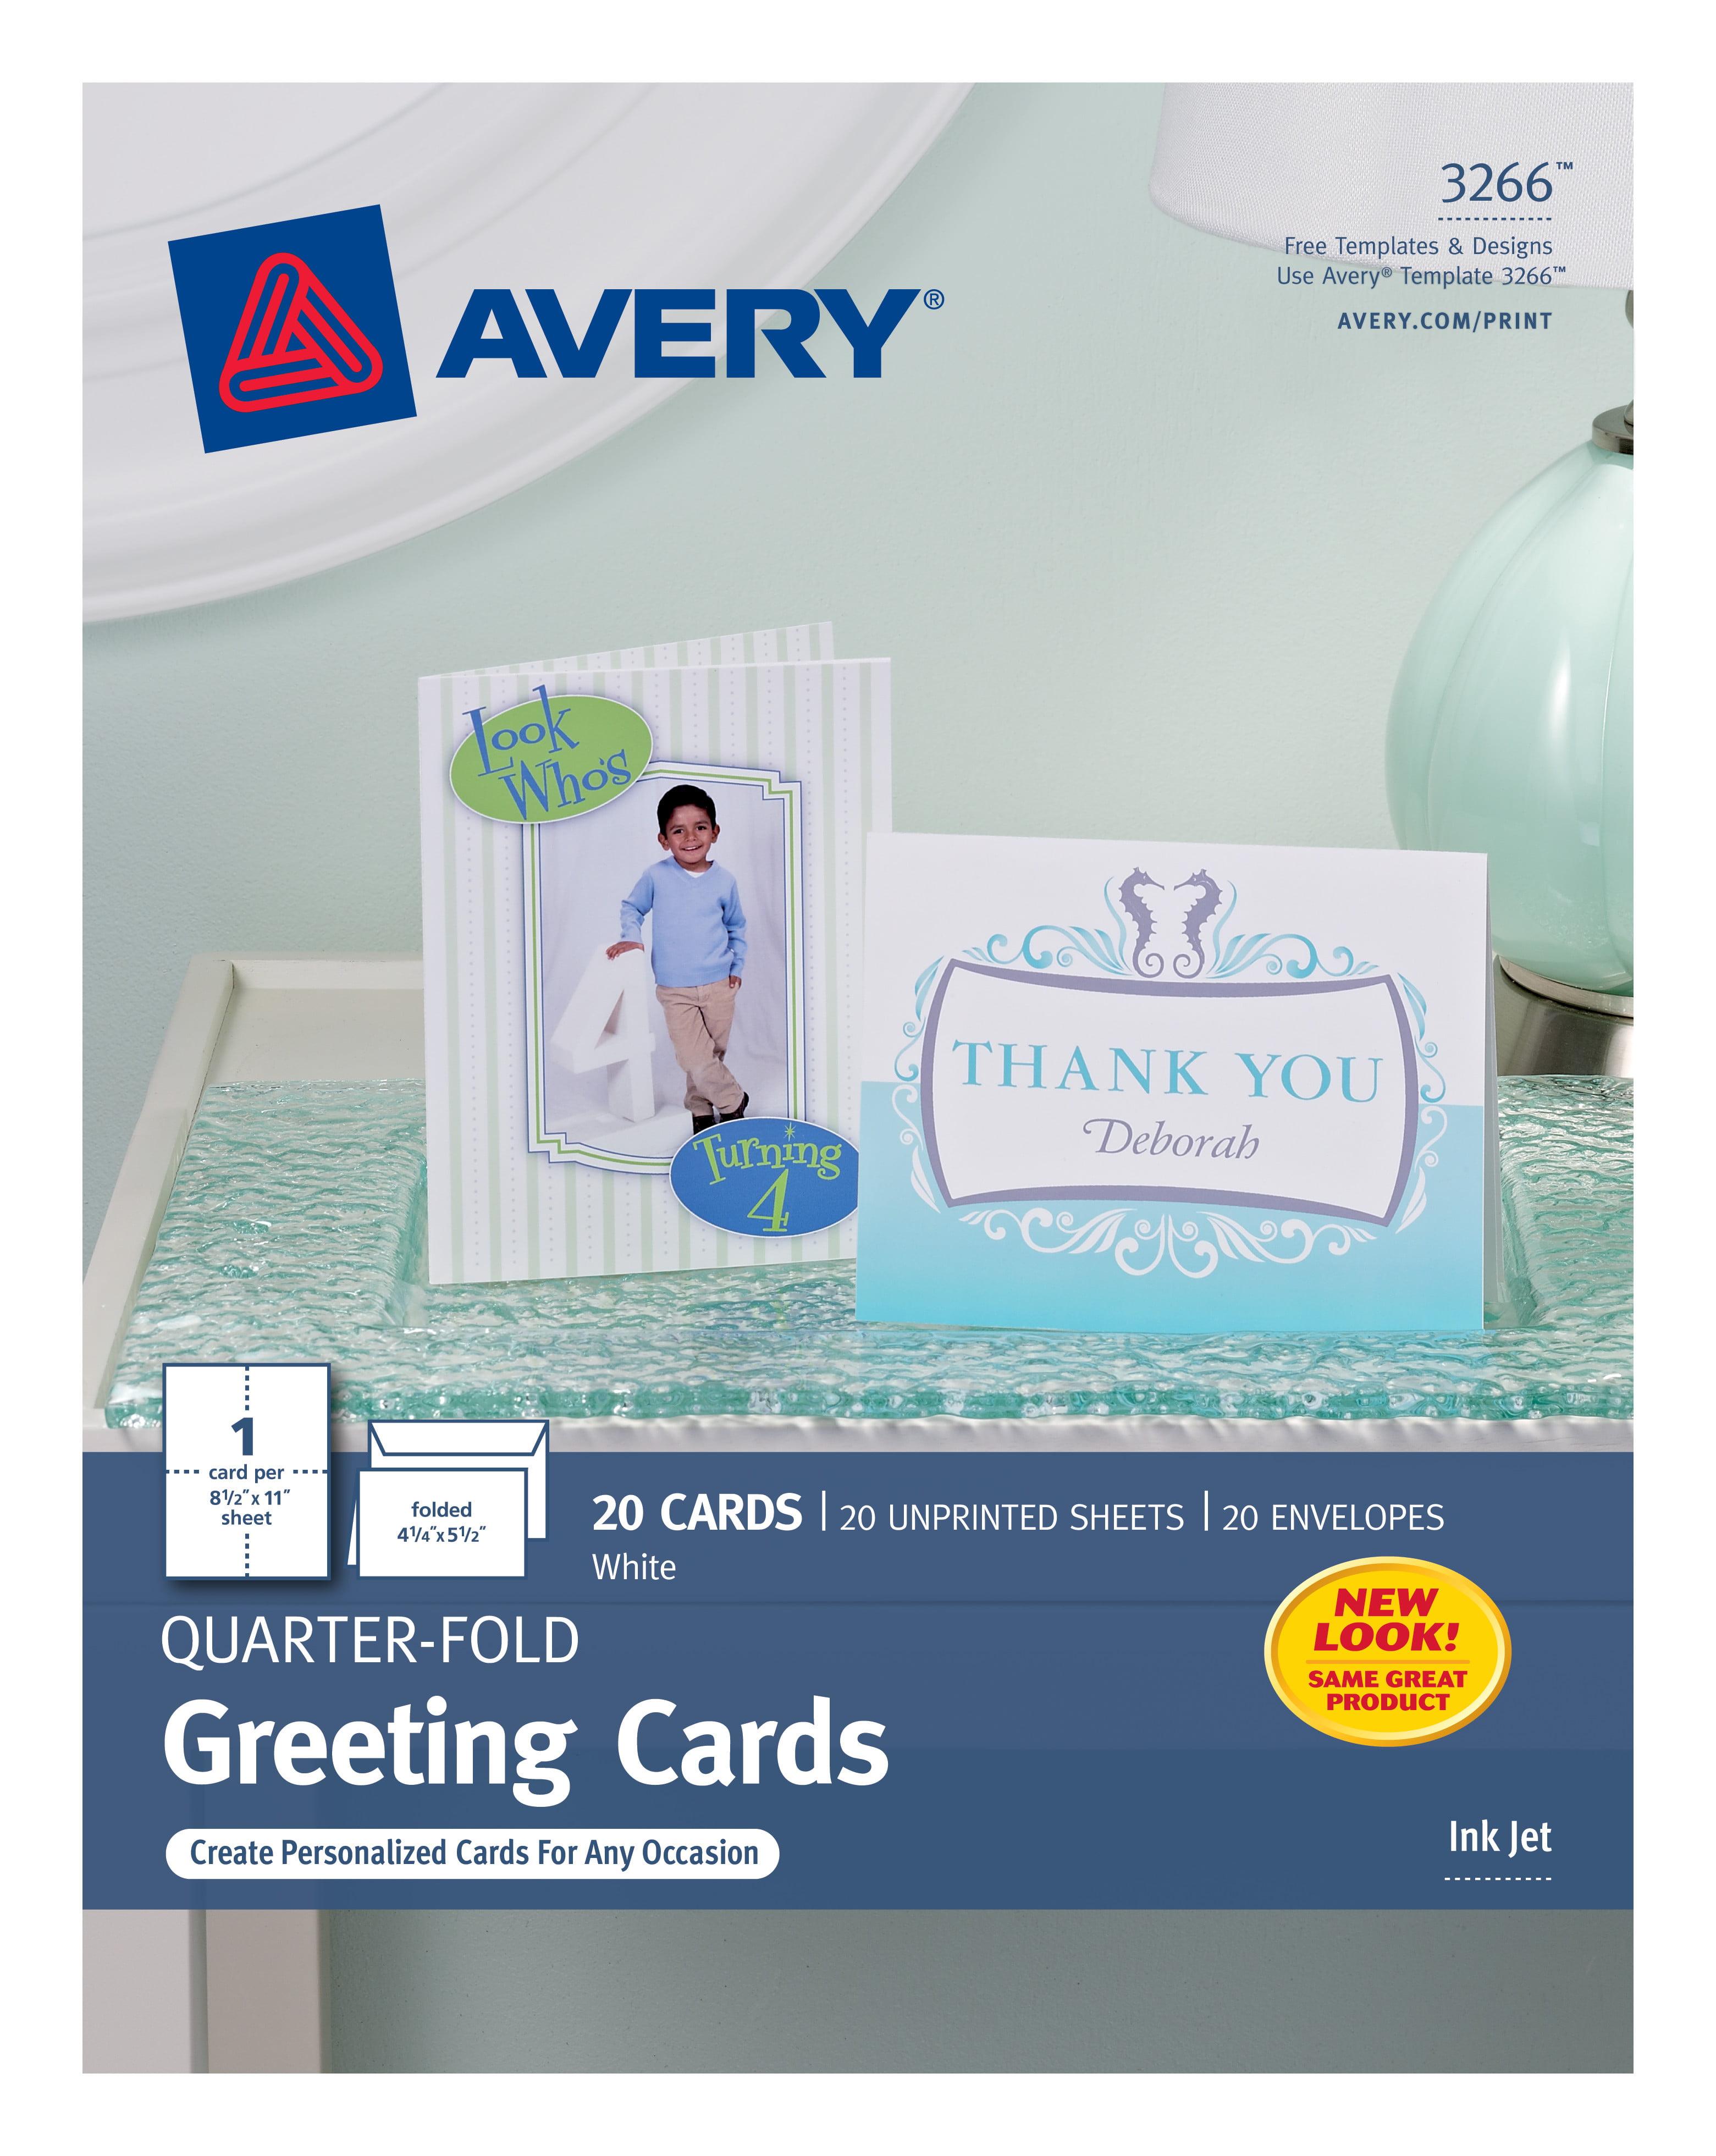 "Avery Quarter-Fold Greeting Cards, Matte, 2121211-21211/2121211"" x 21211-21211/21"", 210  Cards/Envelopes (32166) - Walmart.com With Regard To Quarter Fold Greeting Card Template"